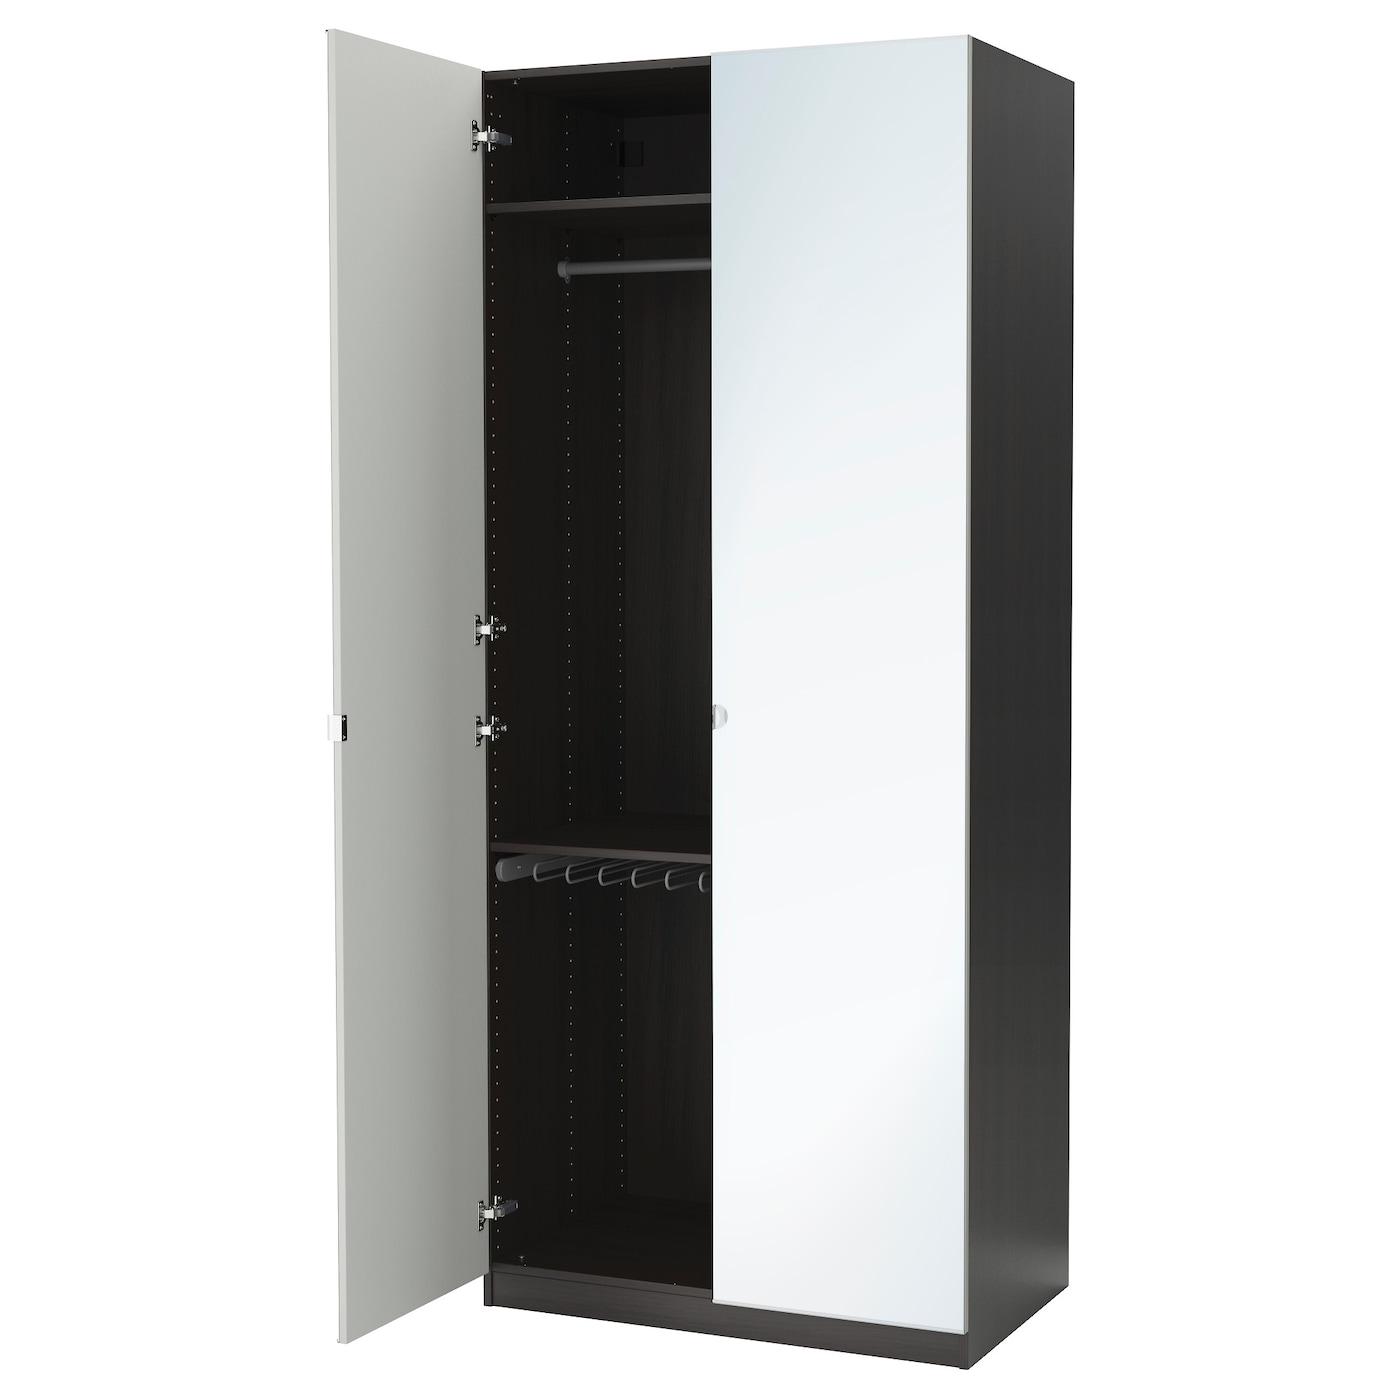 Pax wardrobe black brown vikedal mirror glass 100x60x236 cm ikea - Armoire coulissante profondeur 40 cm ...